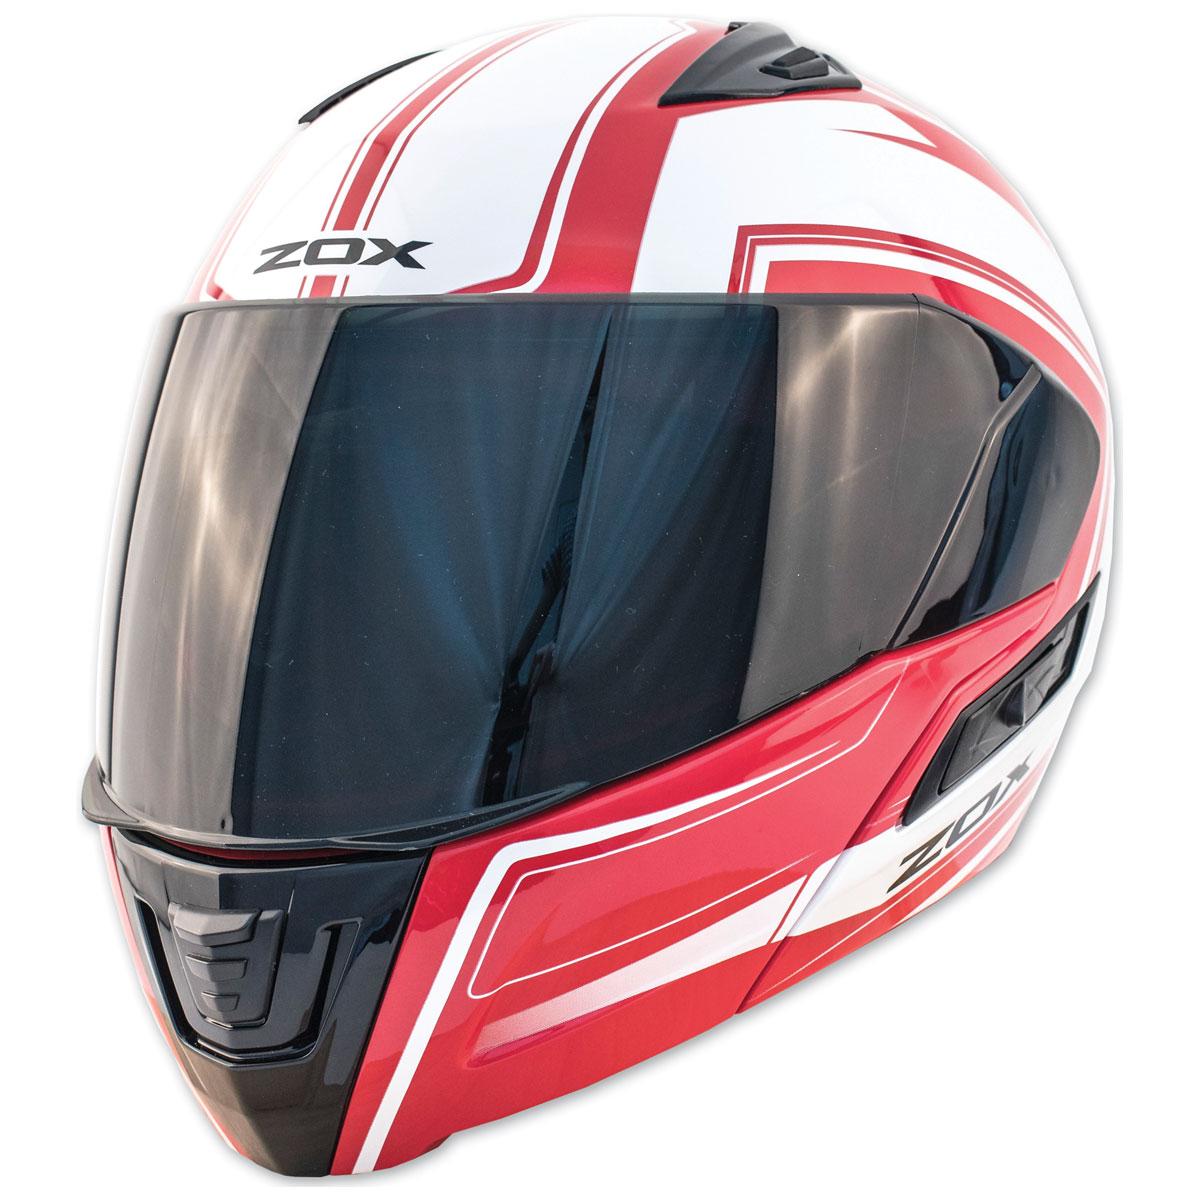 Zox Condor SVS Envoy Red Modular Helmet